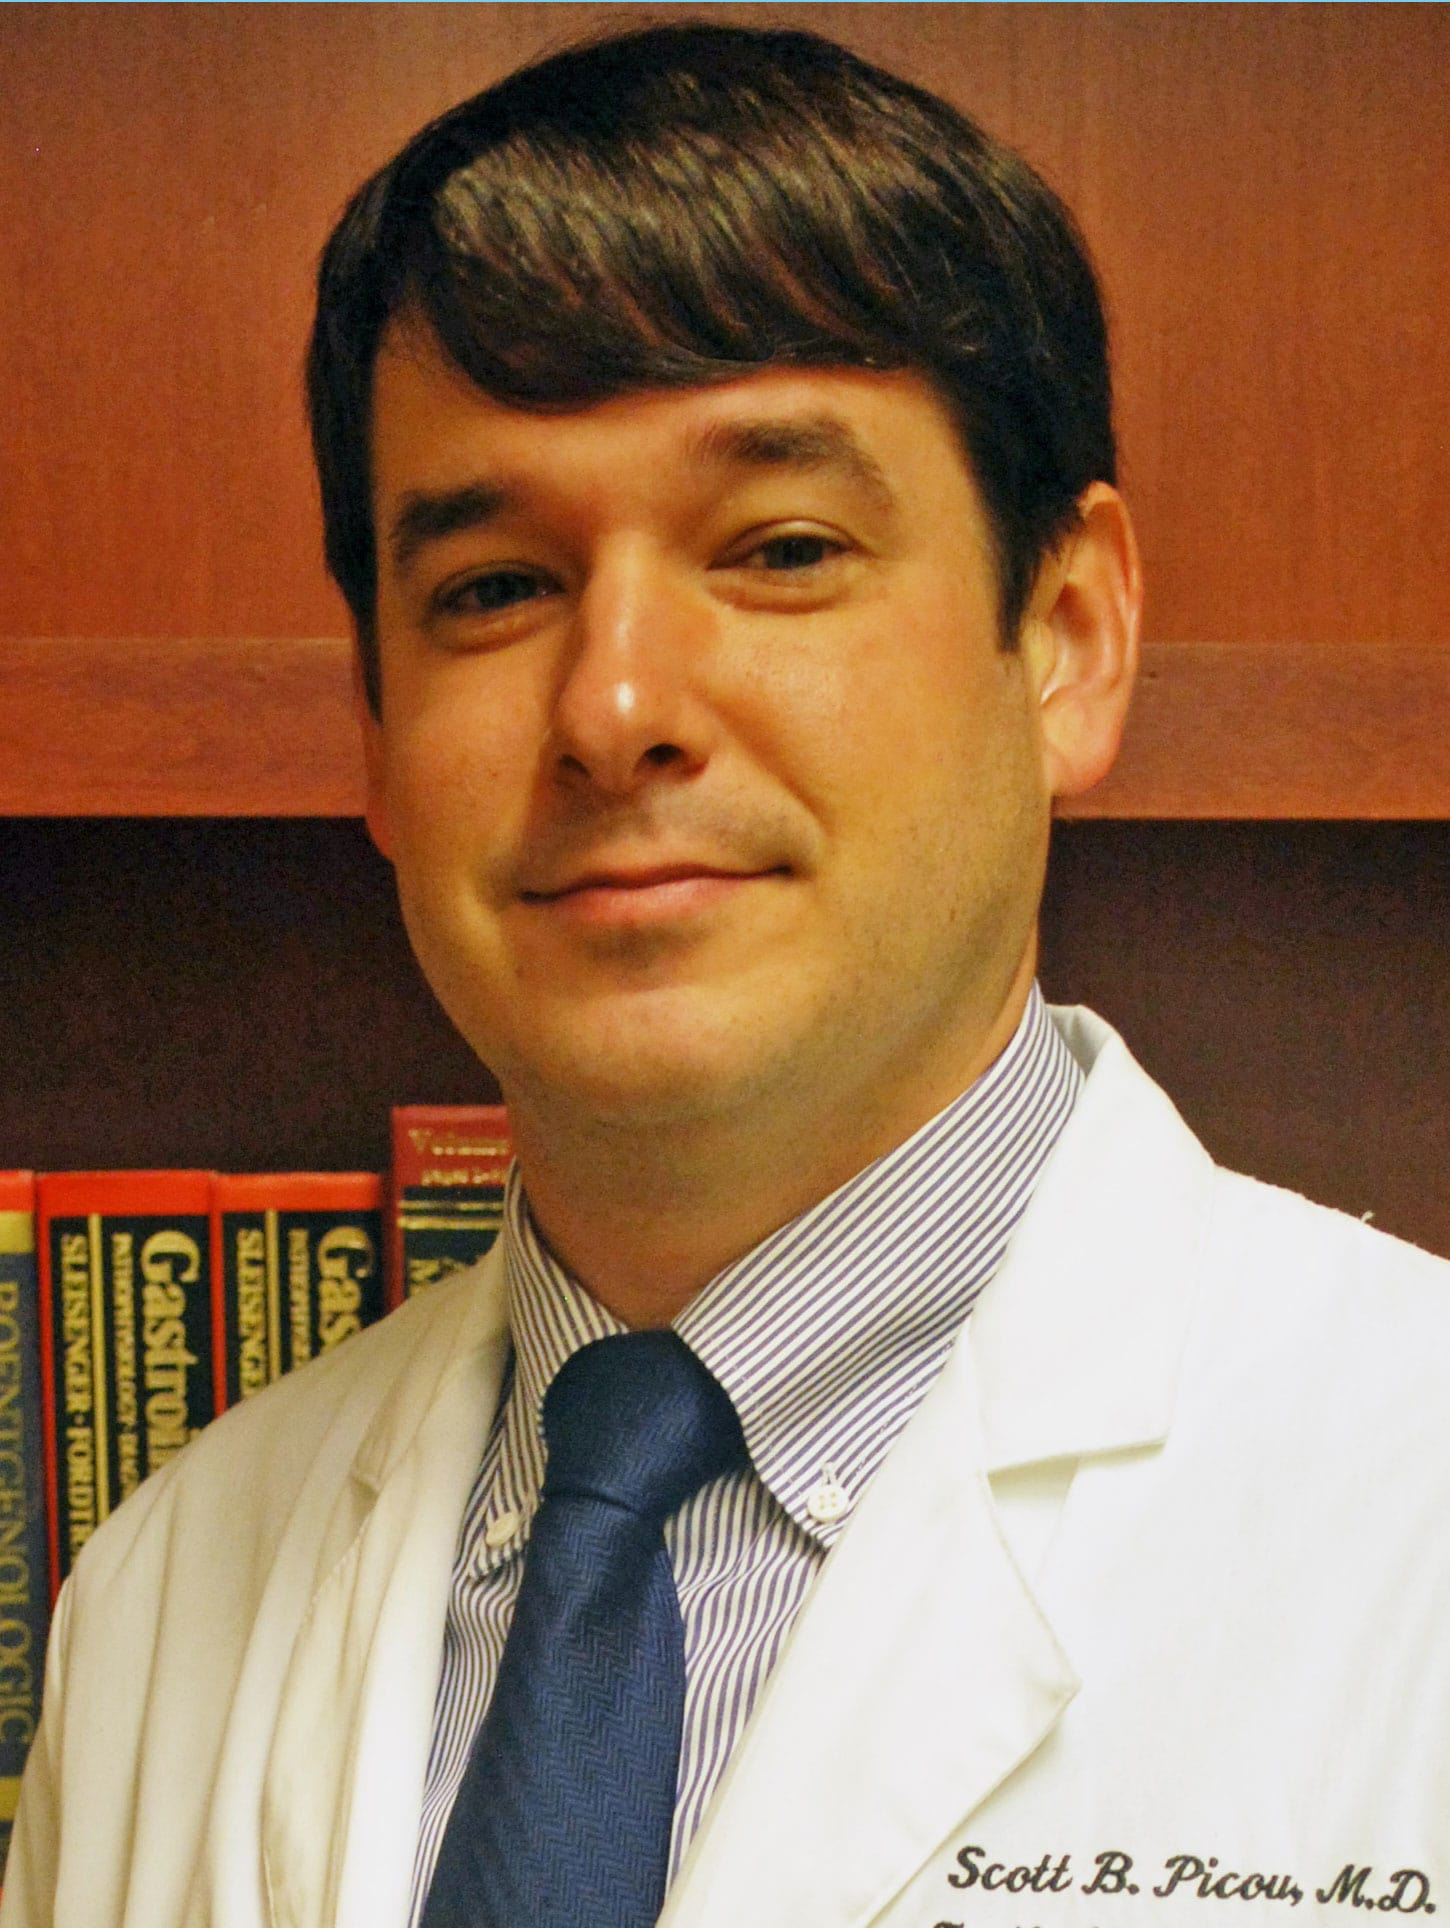 Dr. Scott B Picou MD